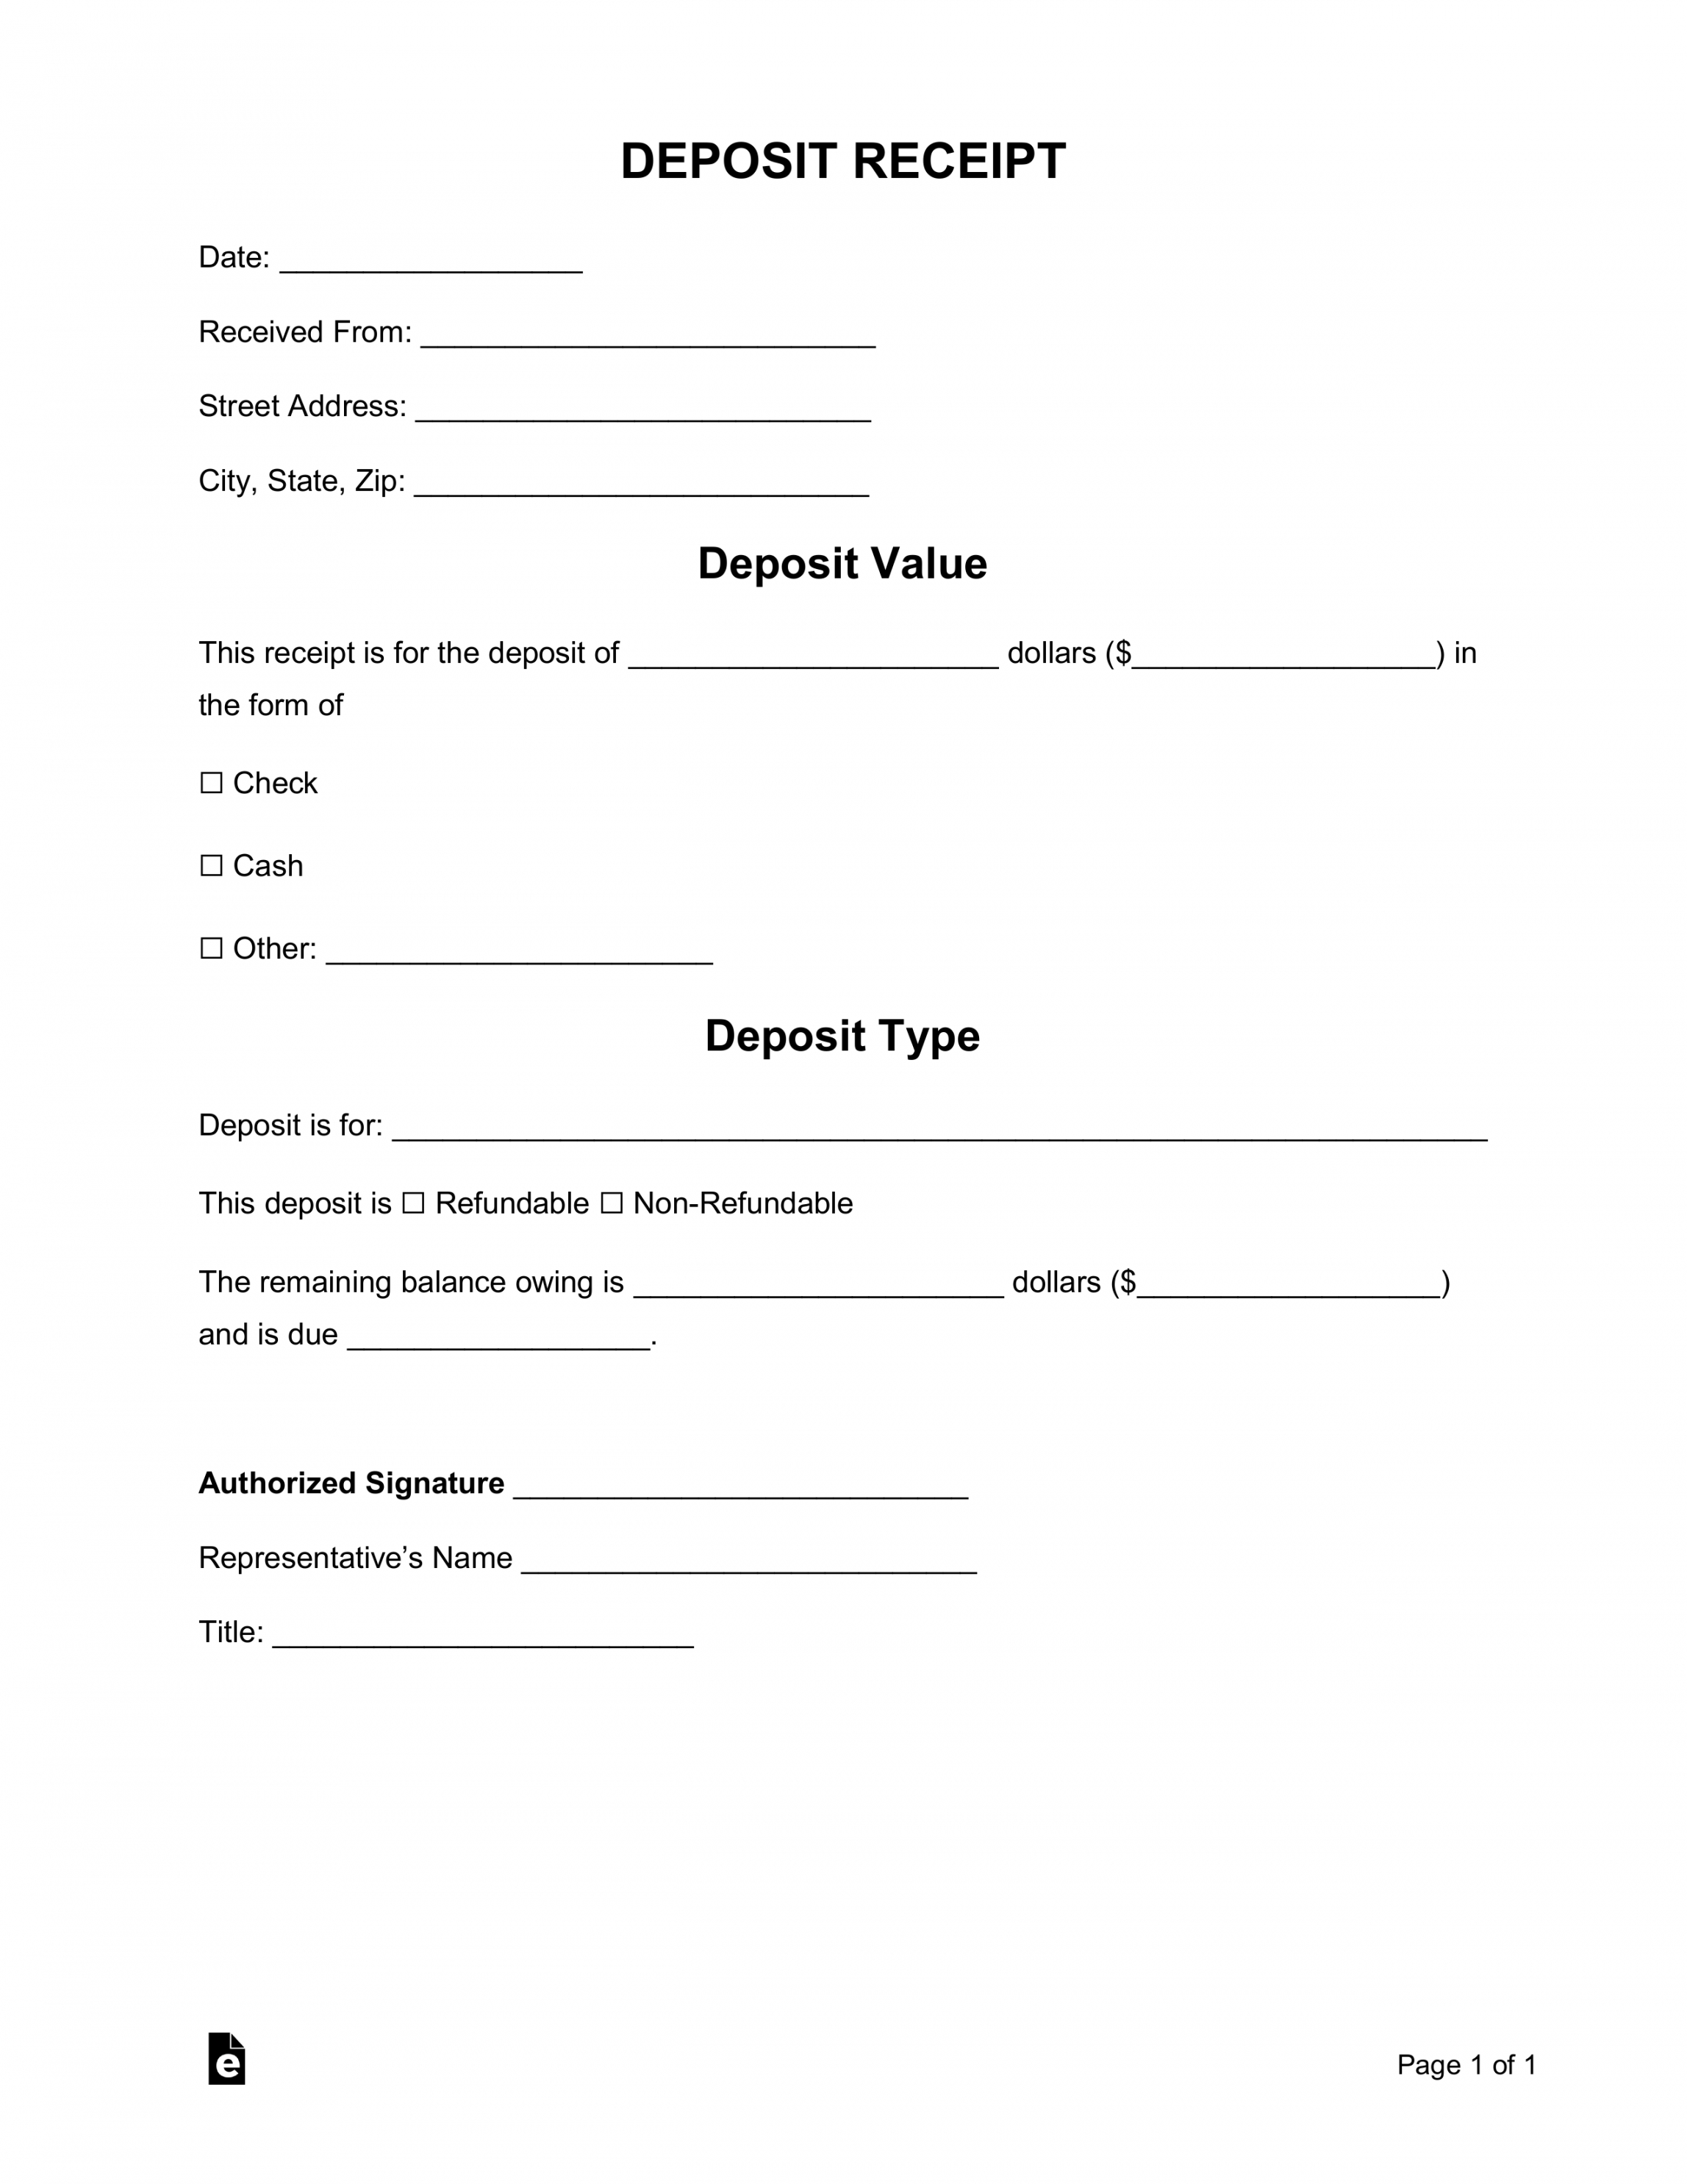 free deposit receipt templates  word  pdf  eforms  free refundable deposit agreement template word